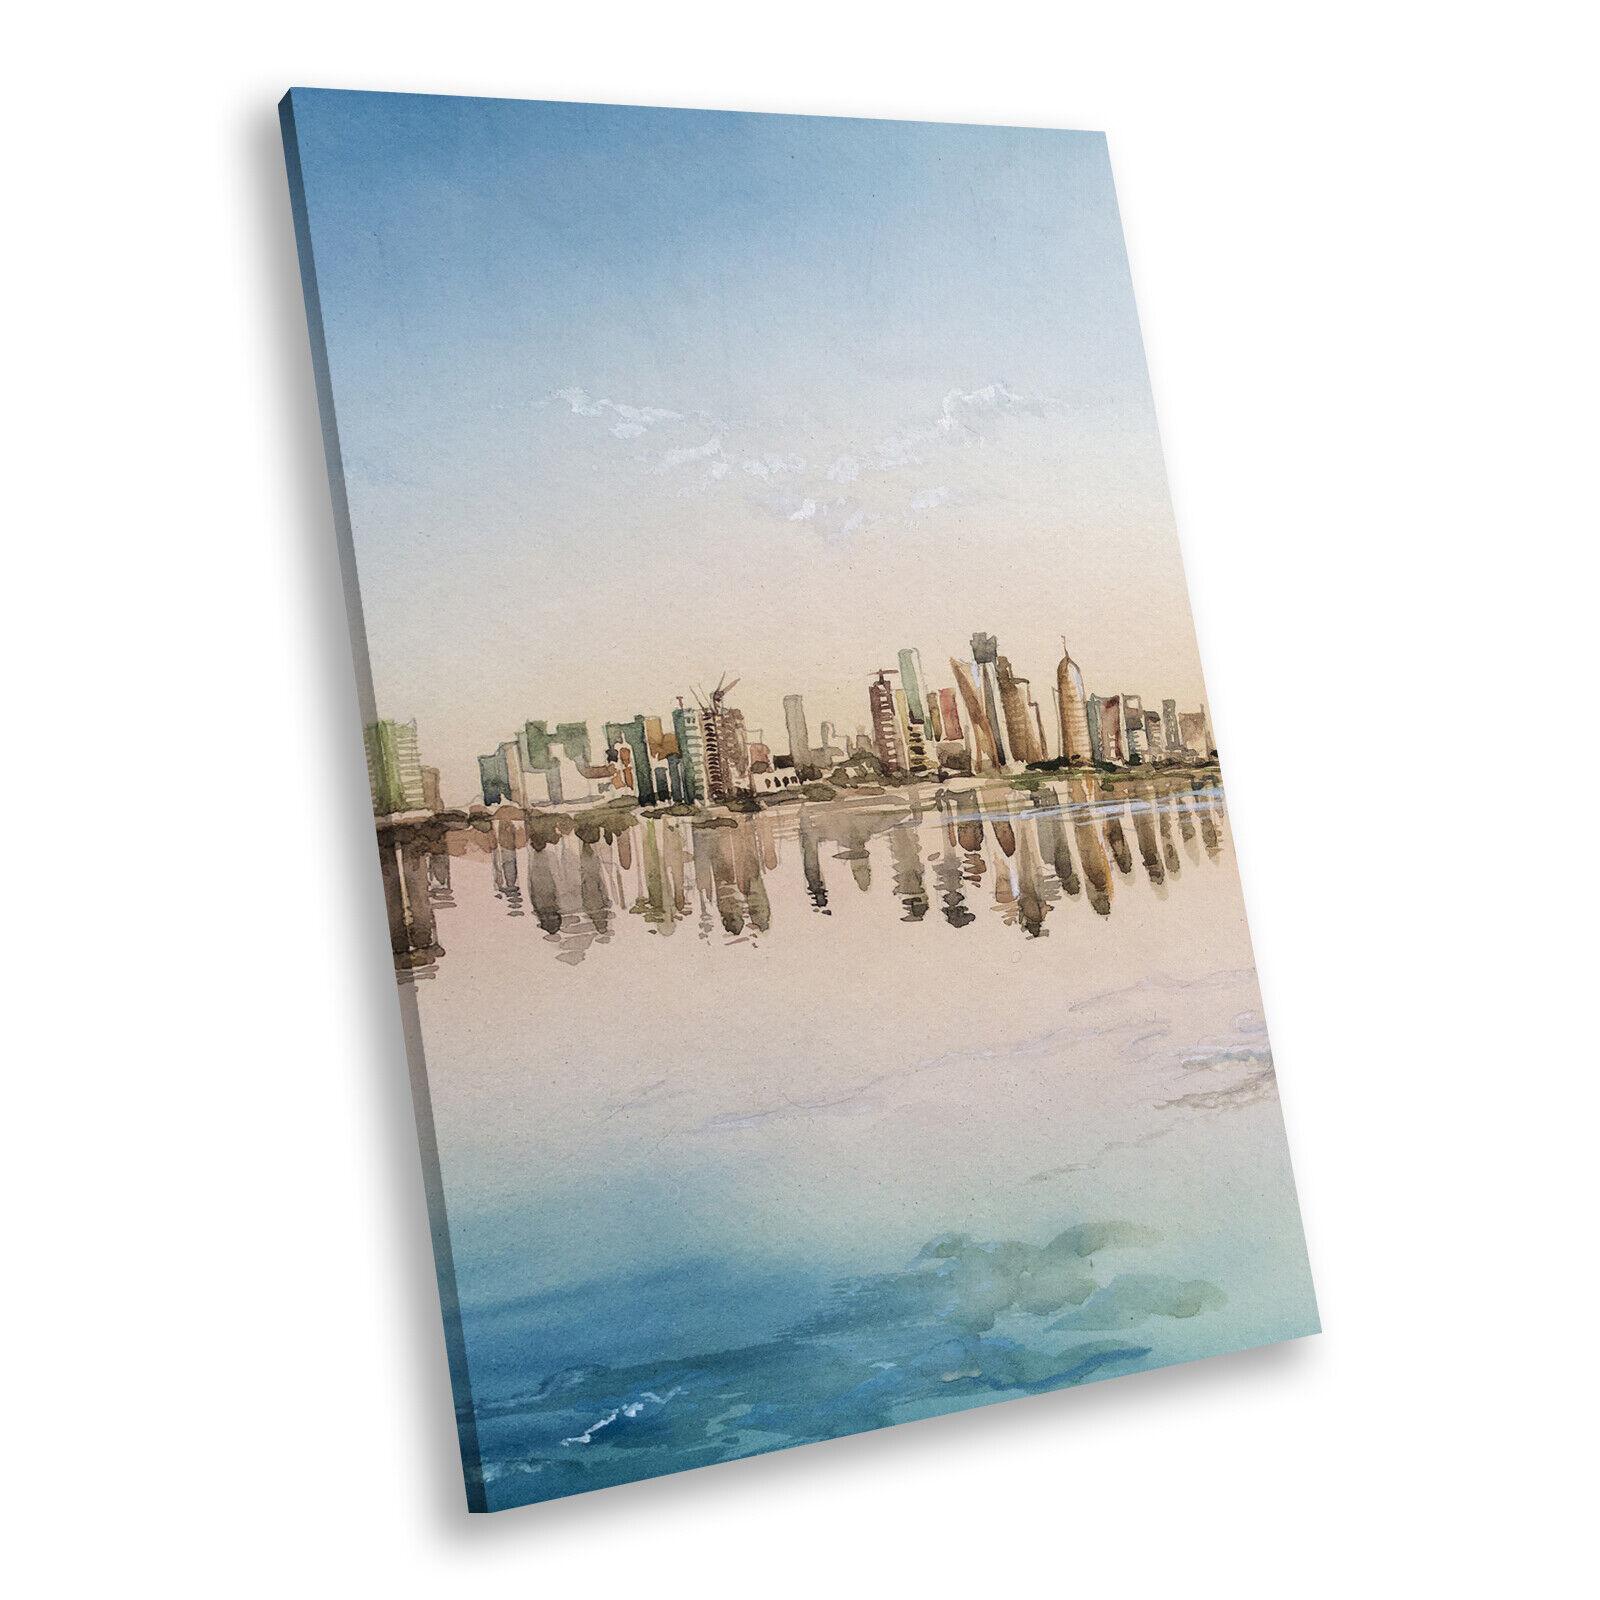 Blau Gelb City Skyline Portrait Scenic Canvas Wall Art Picture Prints